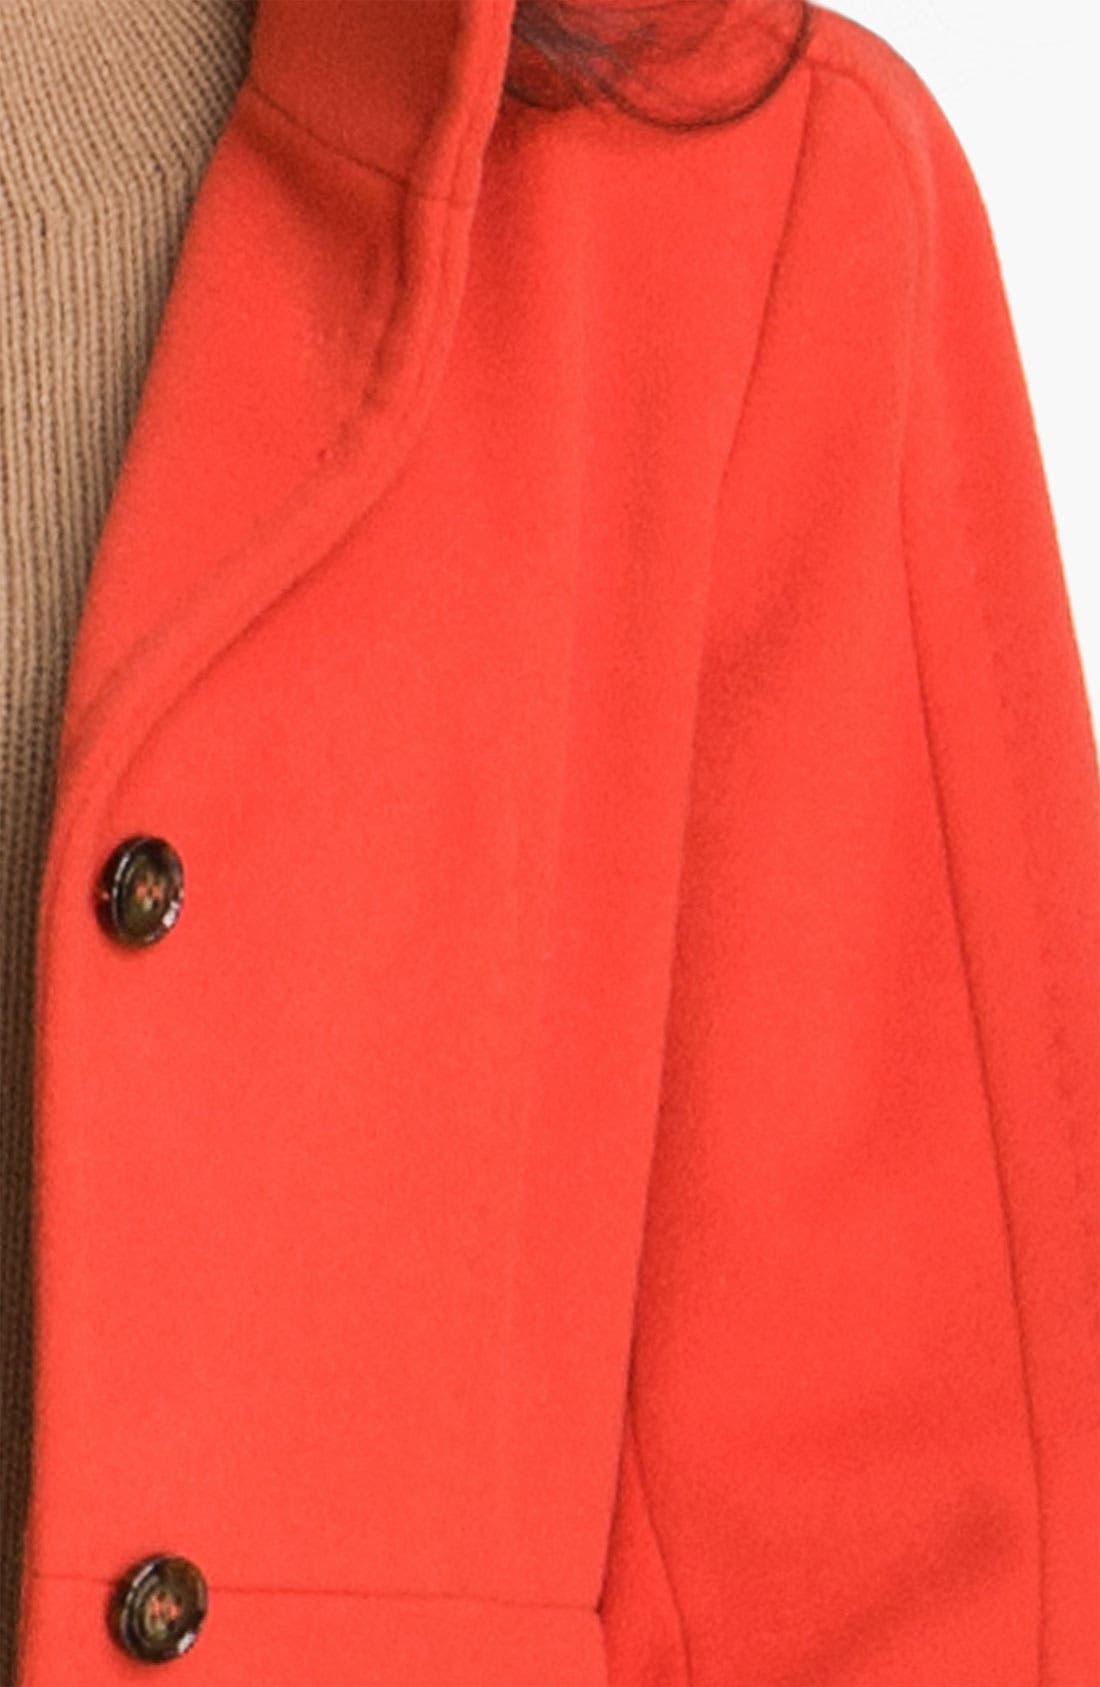 WEEKEND MAX MARA,                             'Mario' Coat,                             Alternate thumbnail 5, color,                             814